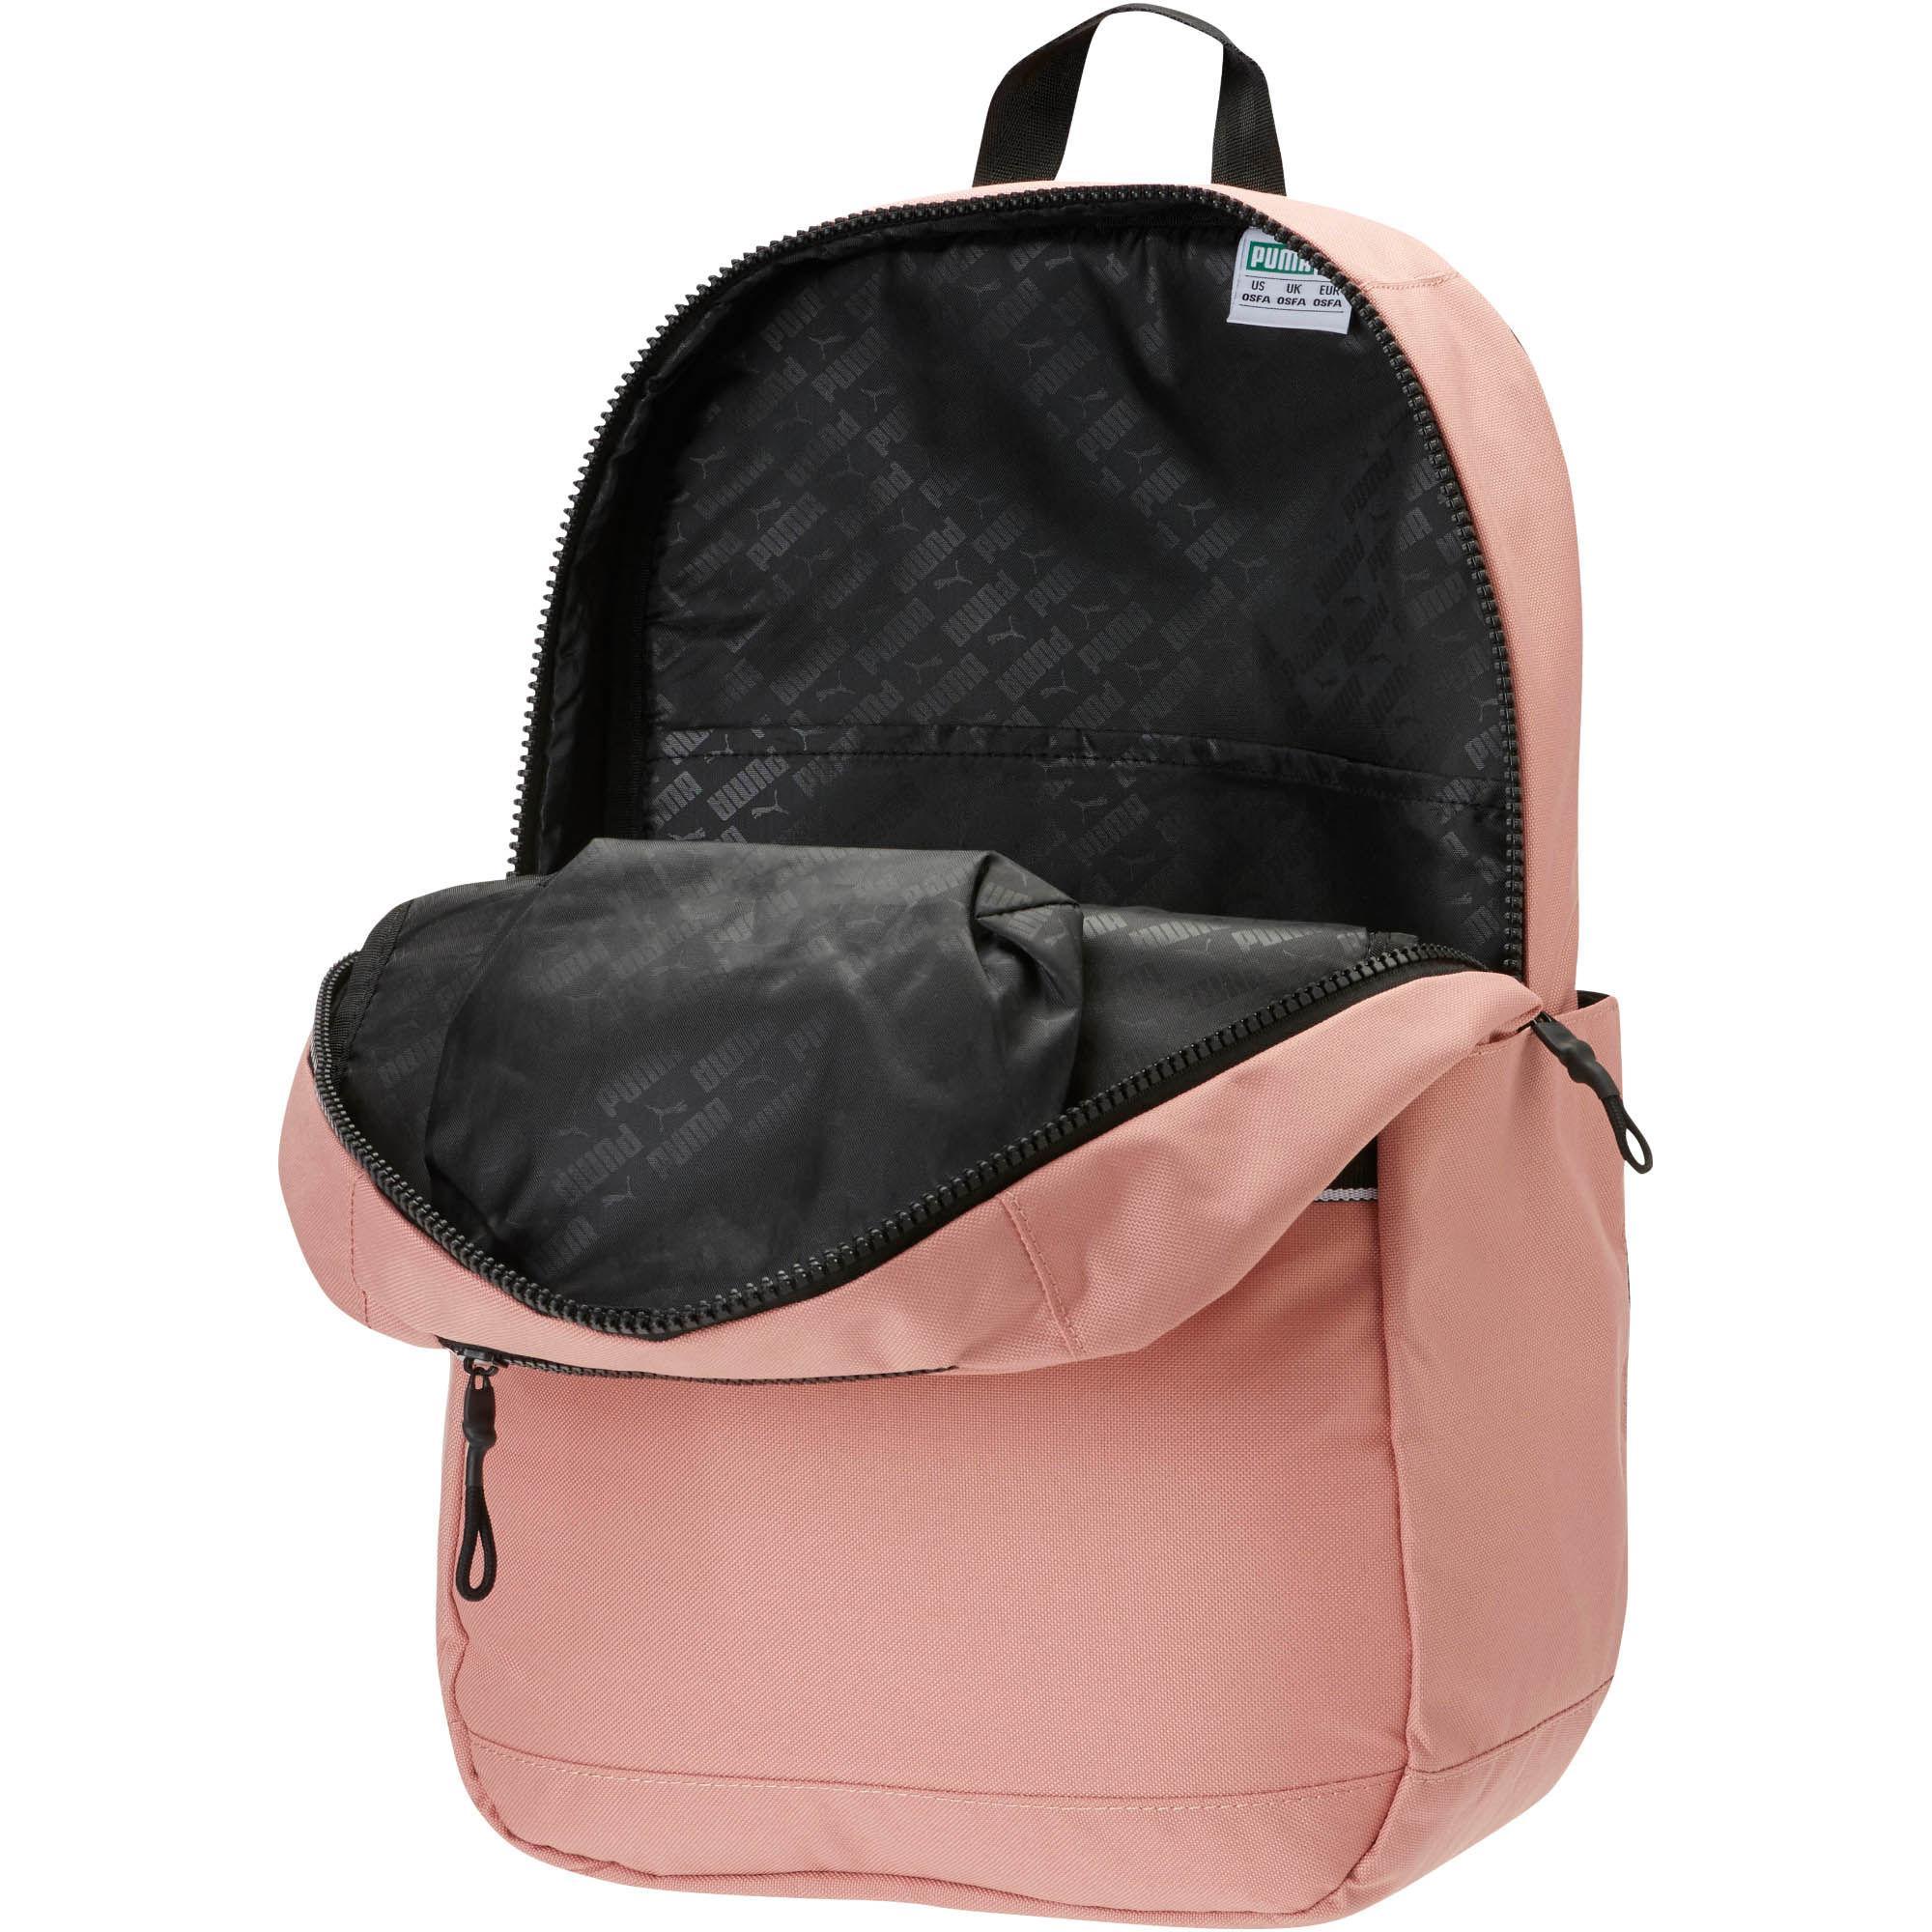 11577b140d Black And Pink Puma Backpack- Fenix Toulouse Handball